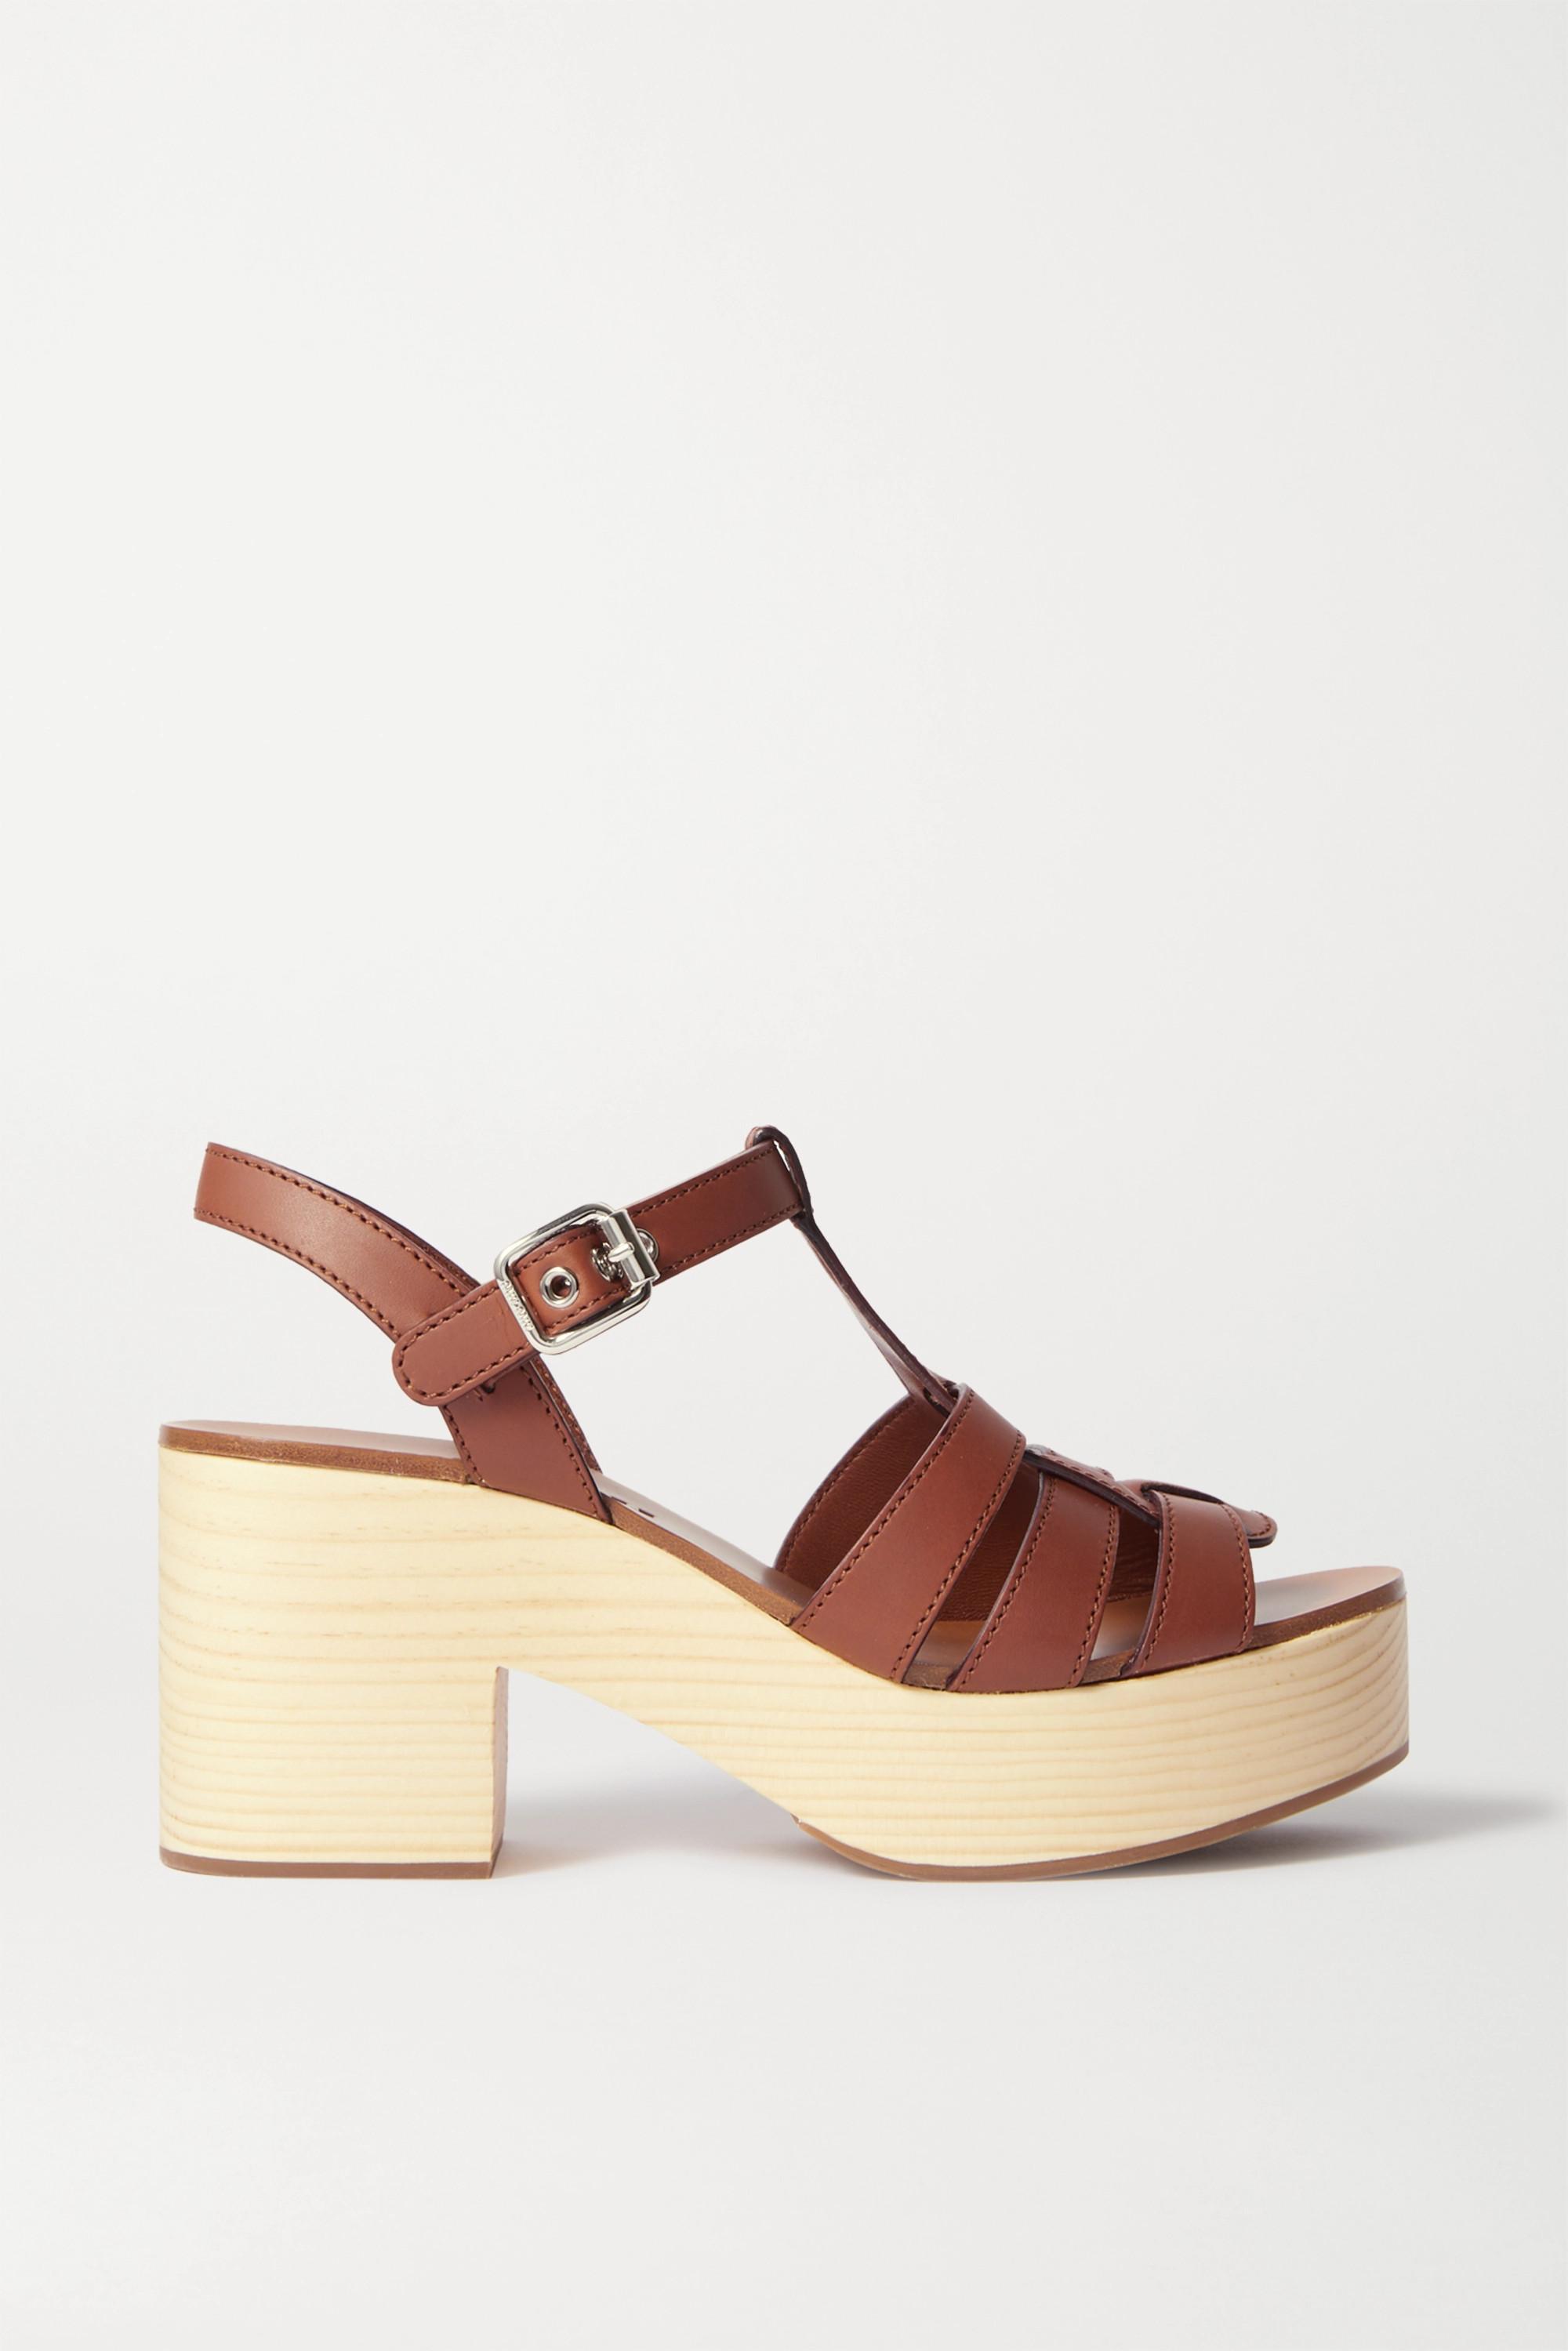 Tan Leather platform sandals | Miu Miu